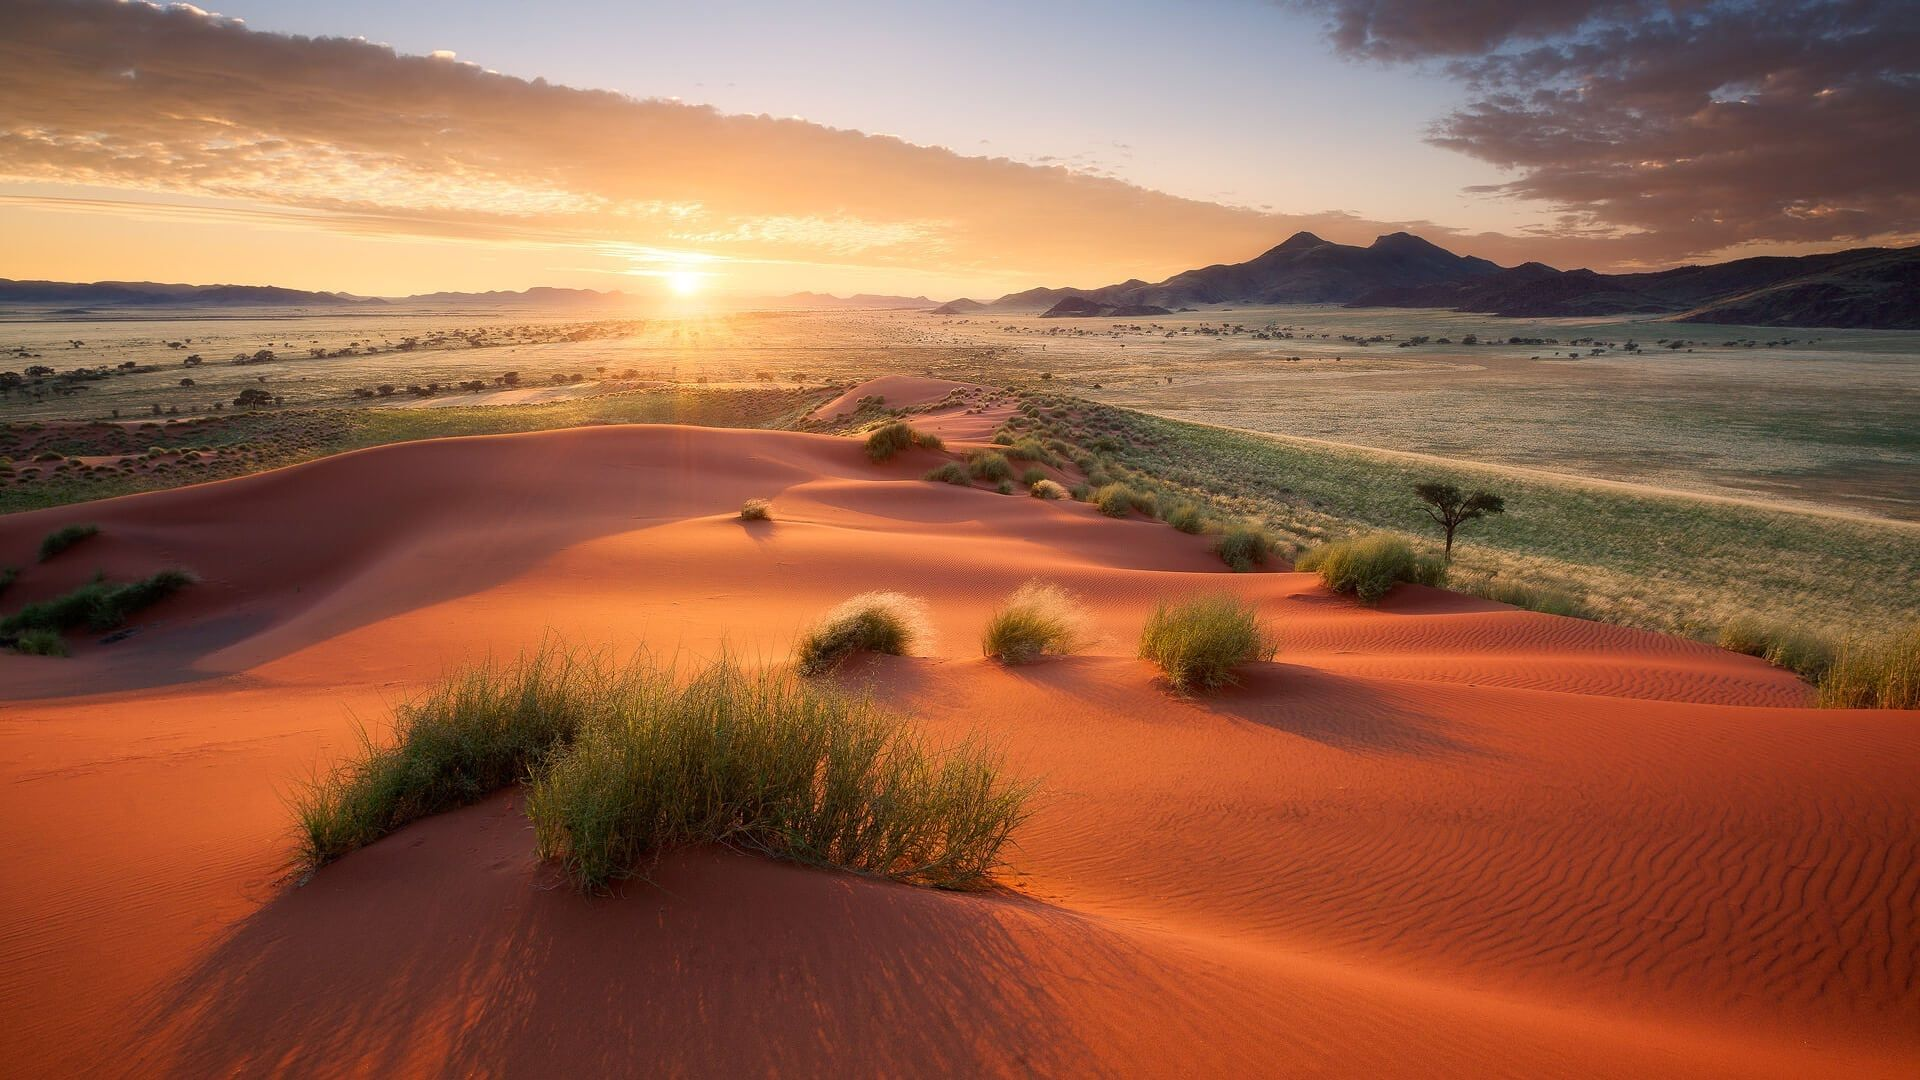 Desert Foothills Landscape wallpaper free